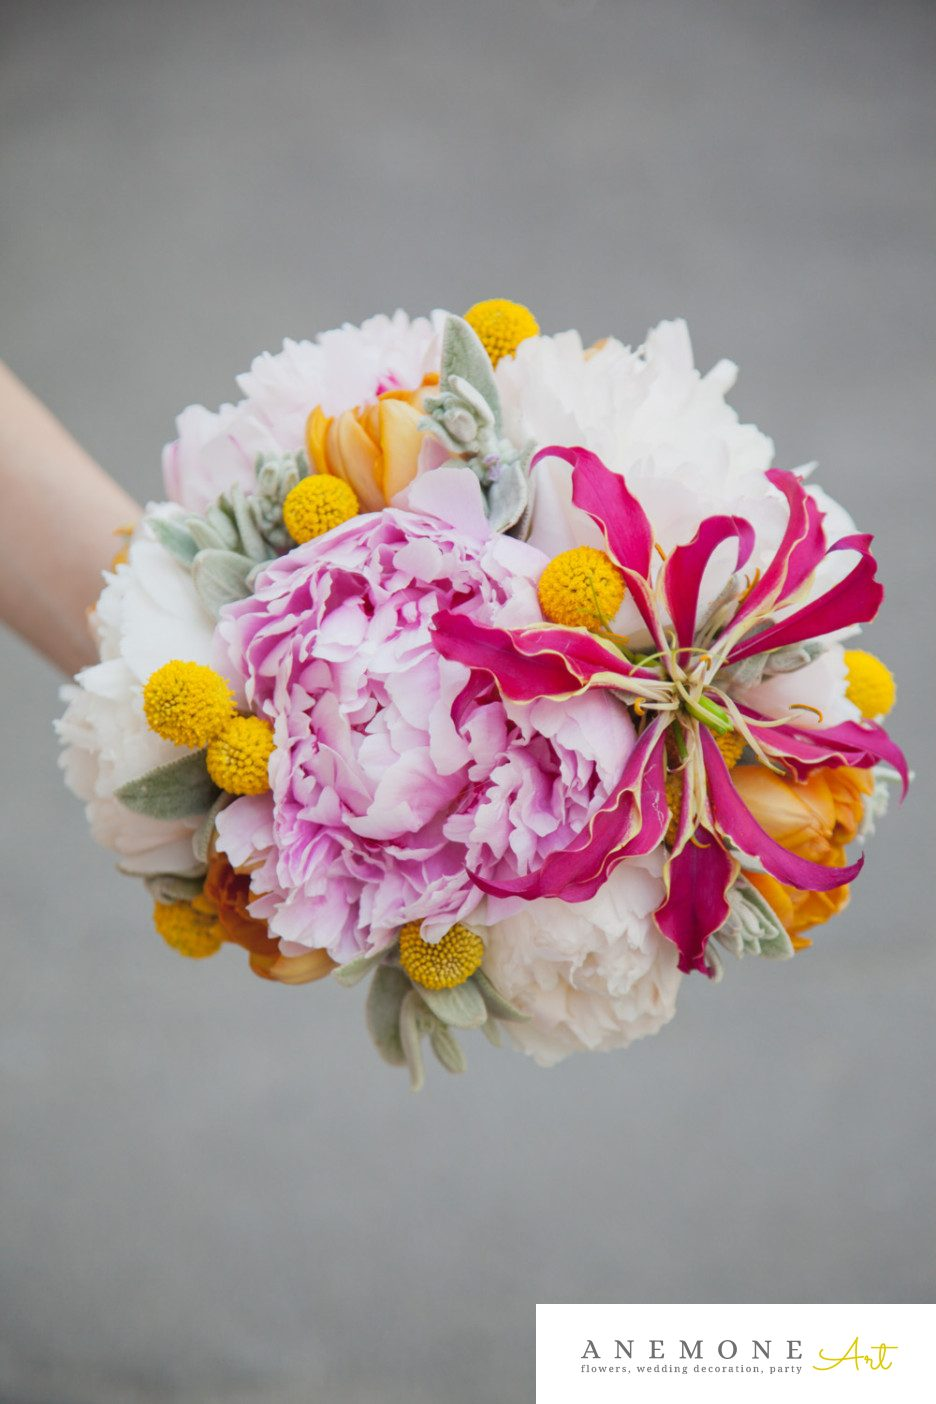 Poza, foto cu Flori de nunta buchet mireasa, bujori, craspedia, galben, gloriosa, roz in Arad, Timisoara, Oradea (wedding flowers, bouquets) nunta Arad, Timisoara, Oradea